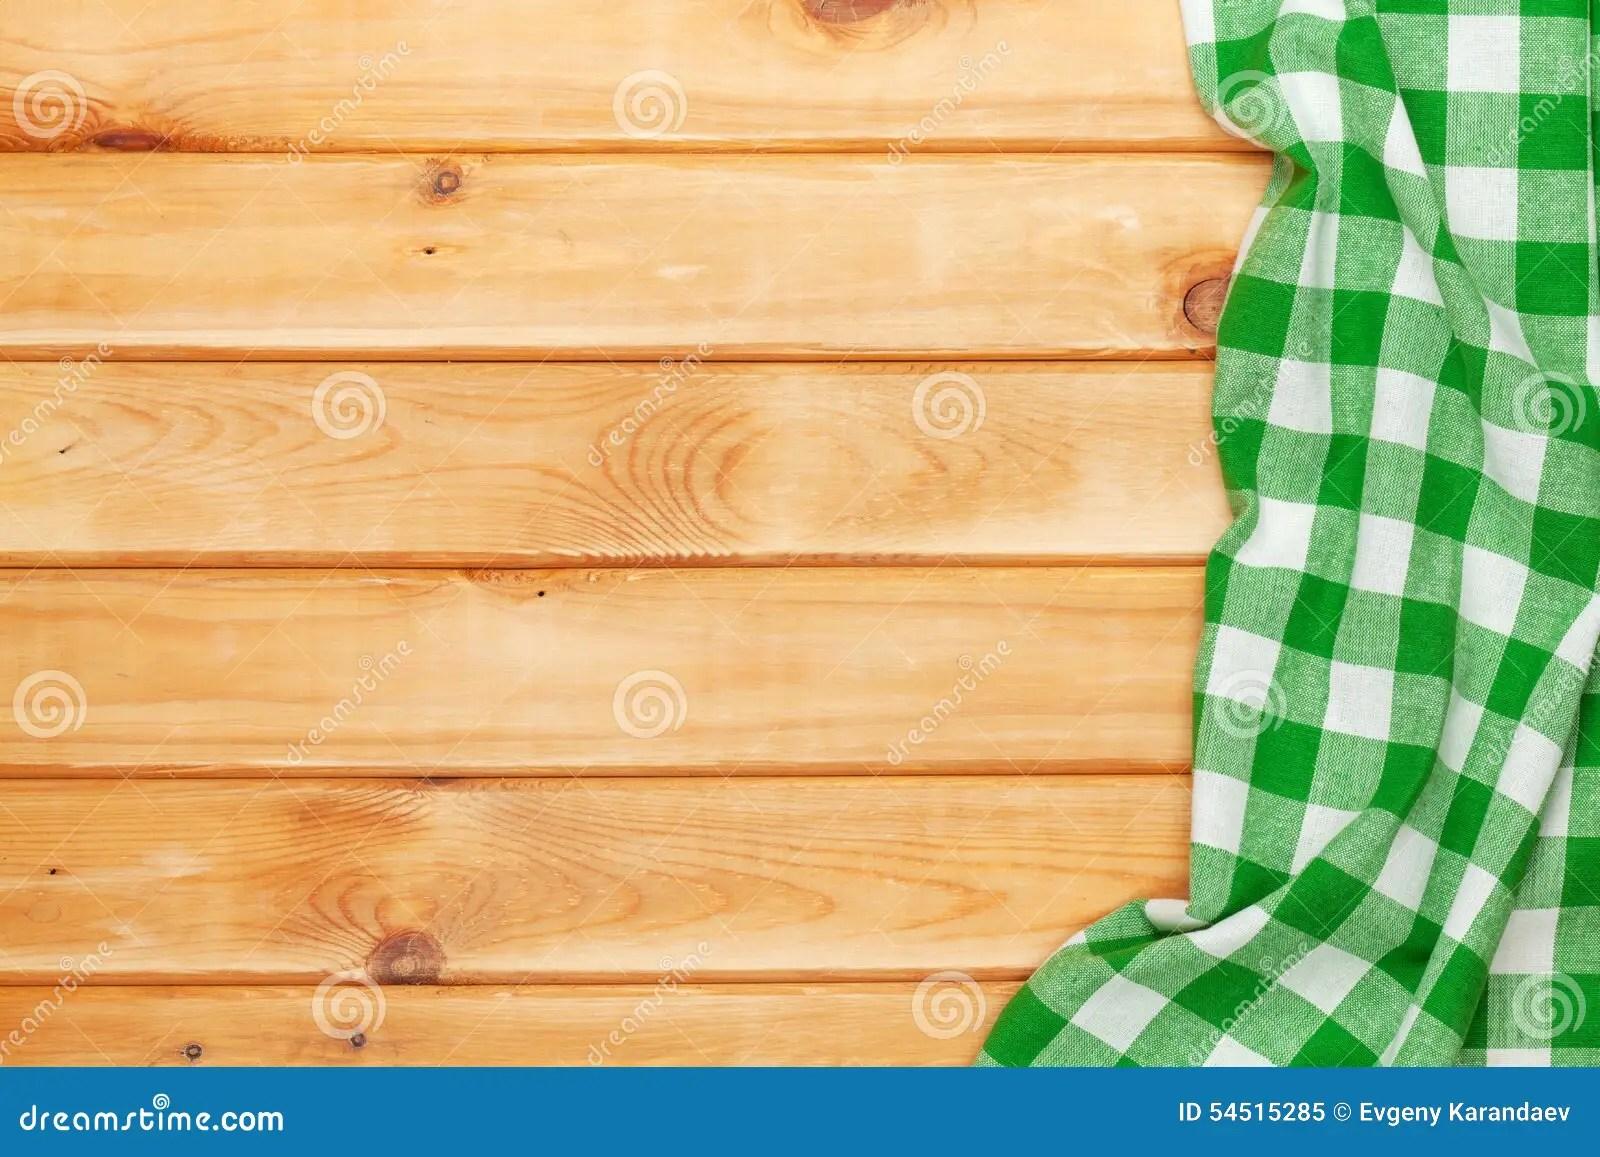 towel for kitchen large rug 在木厨房用桌的绿色毛巾库存图片 图片包括有织品 复制 布料 棉花 在木厨房用桌的绿色毛巾